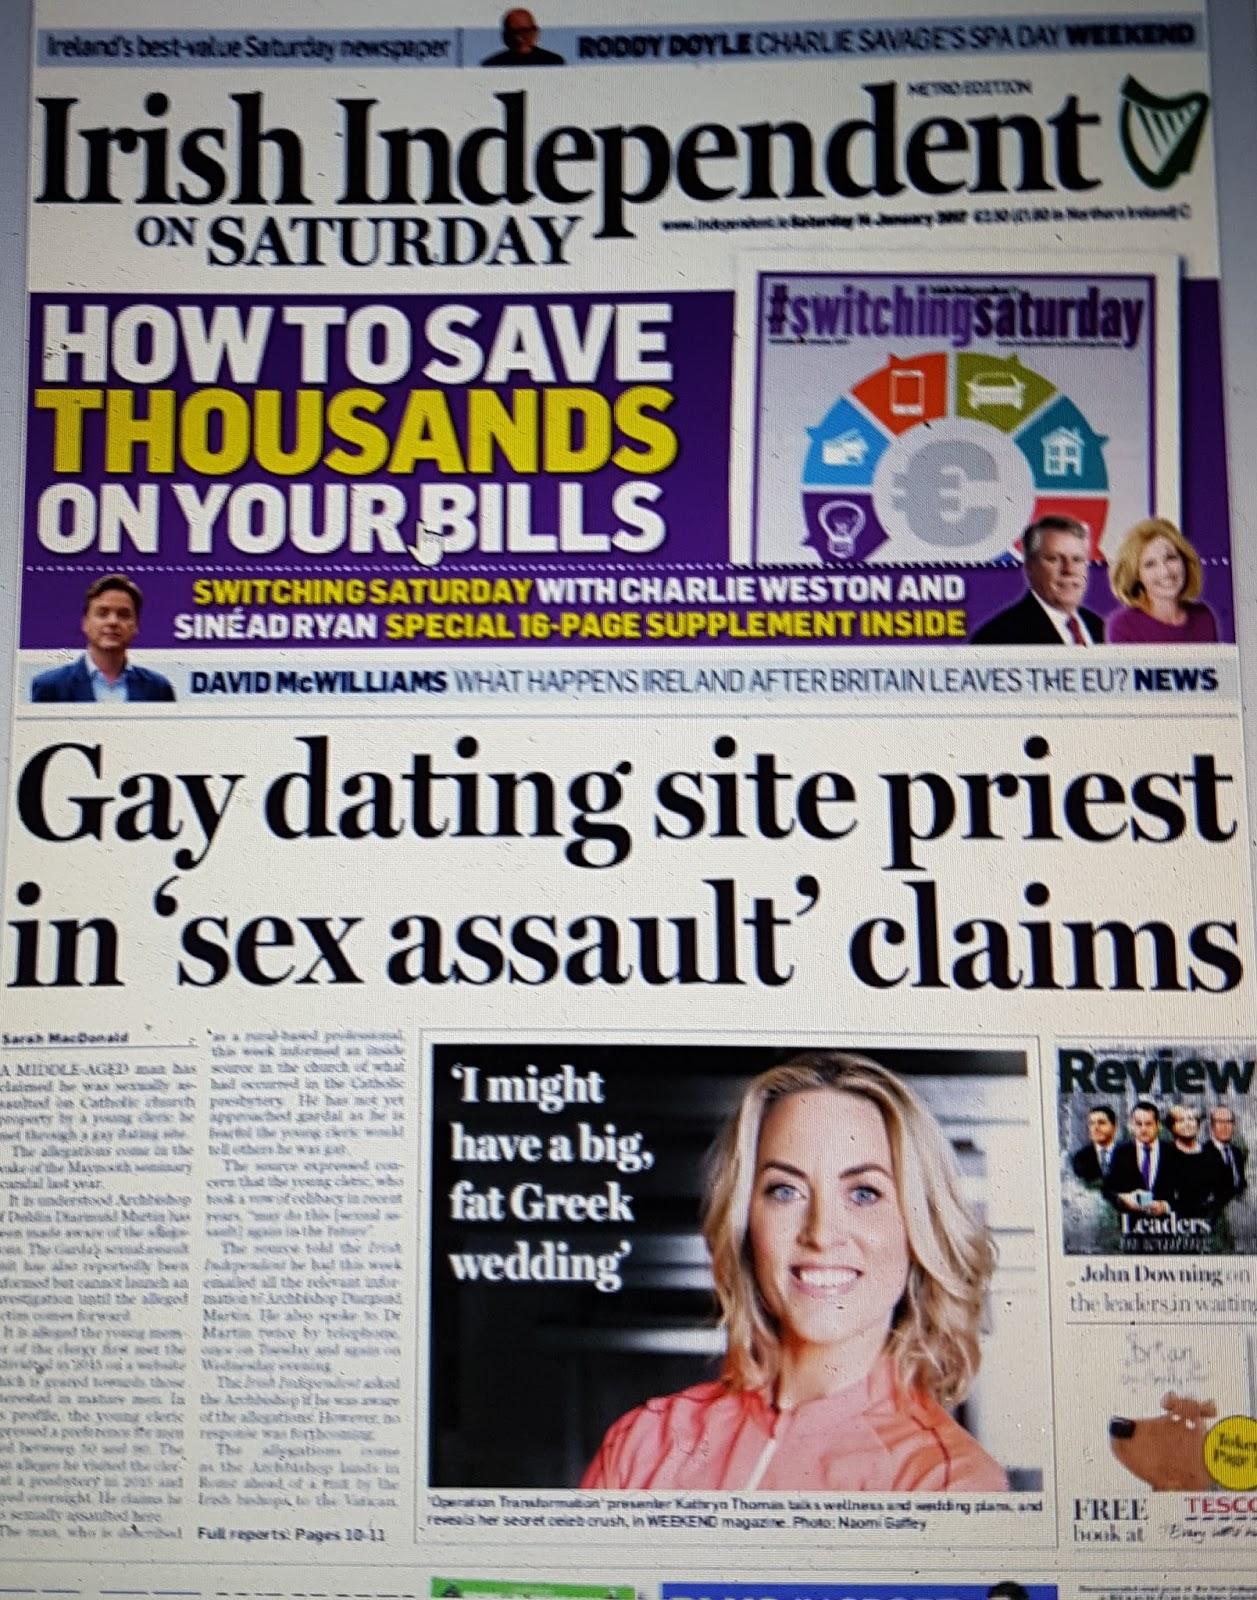 gay dating website ireland